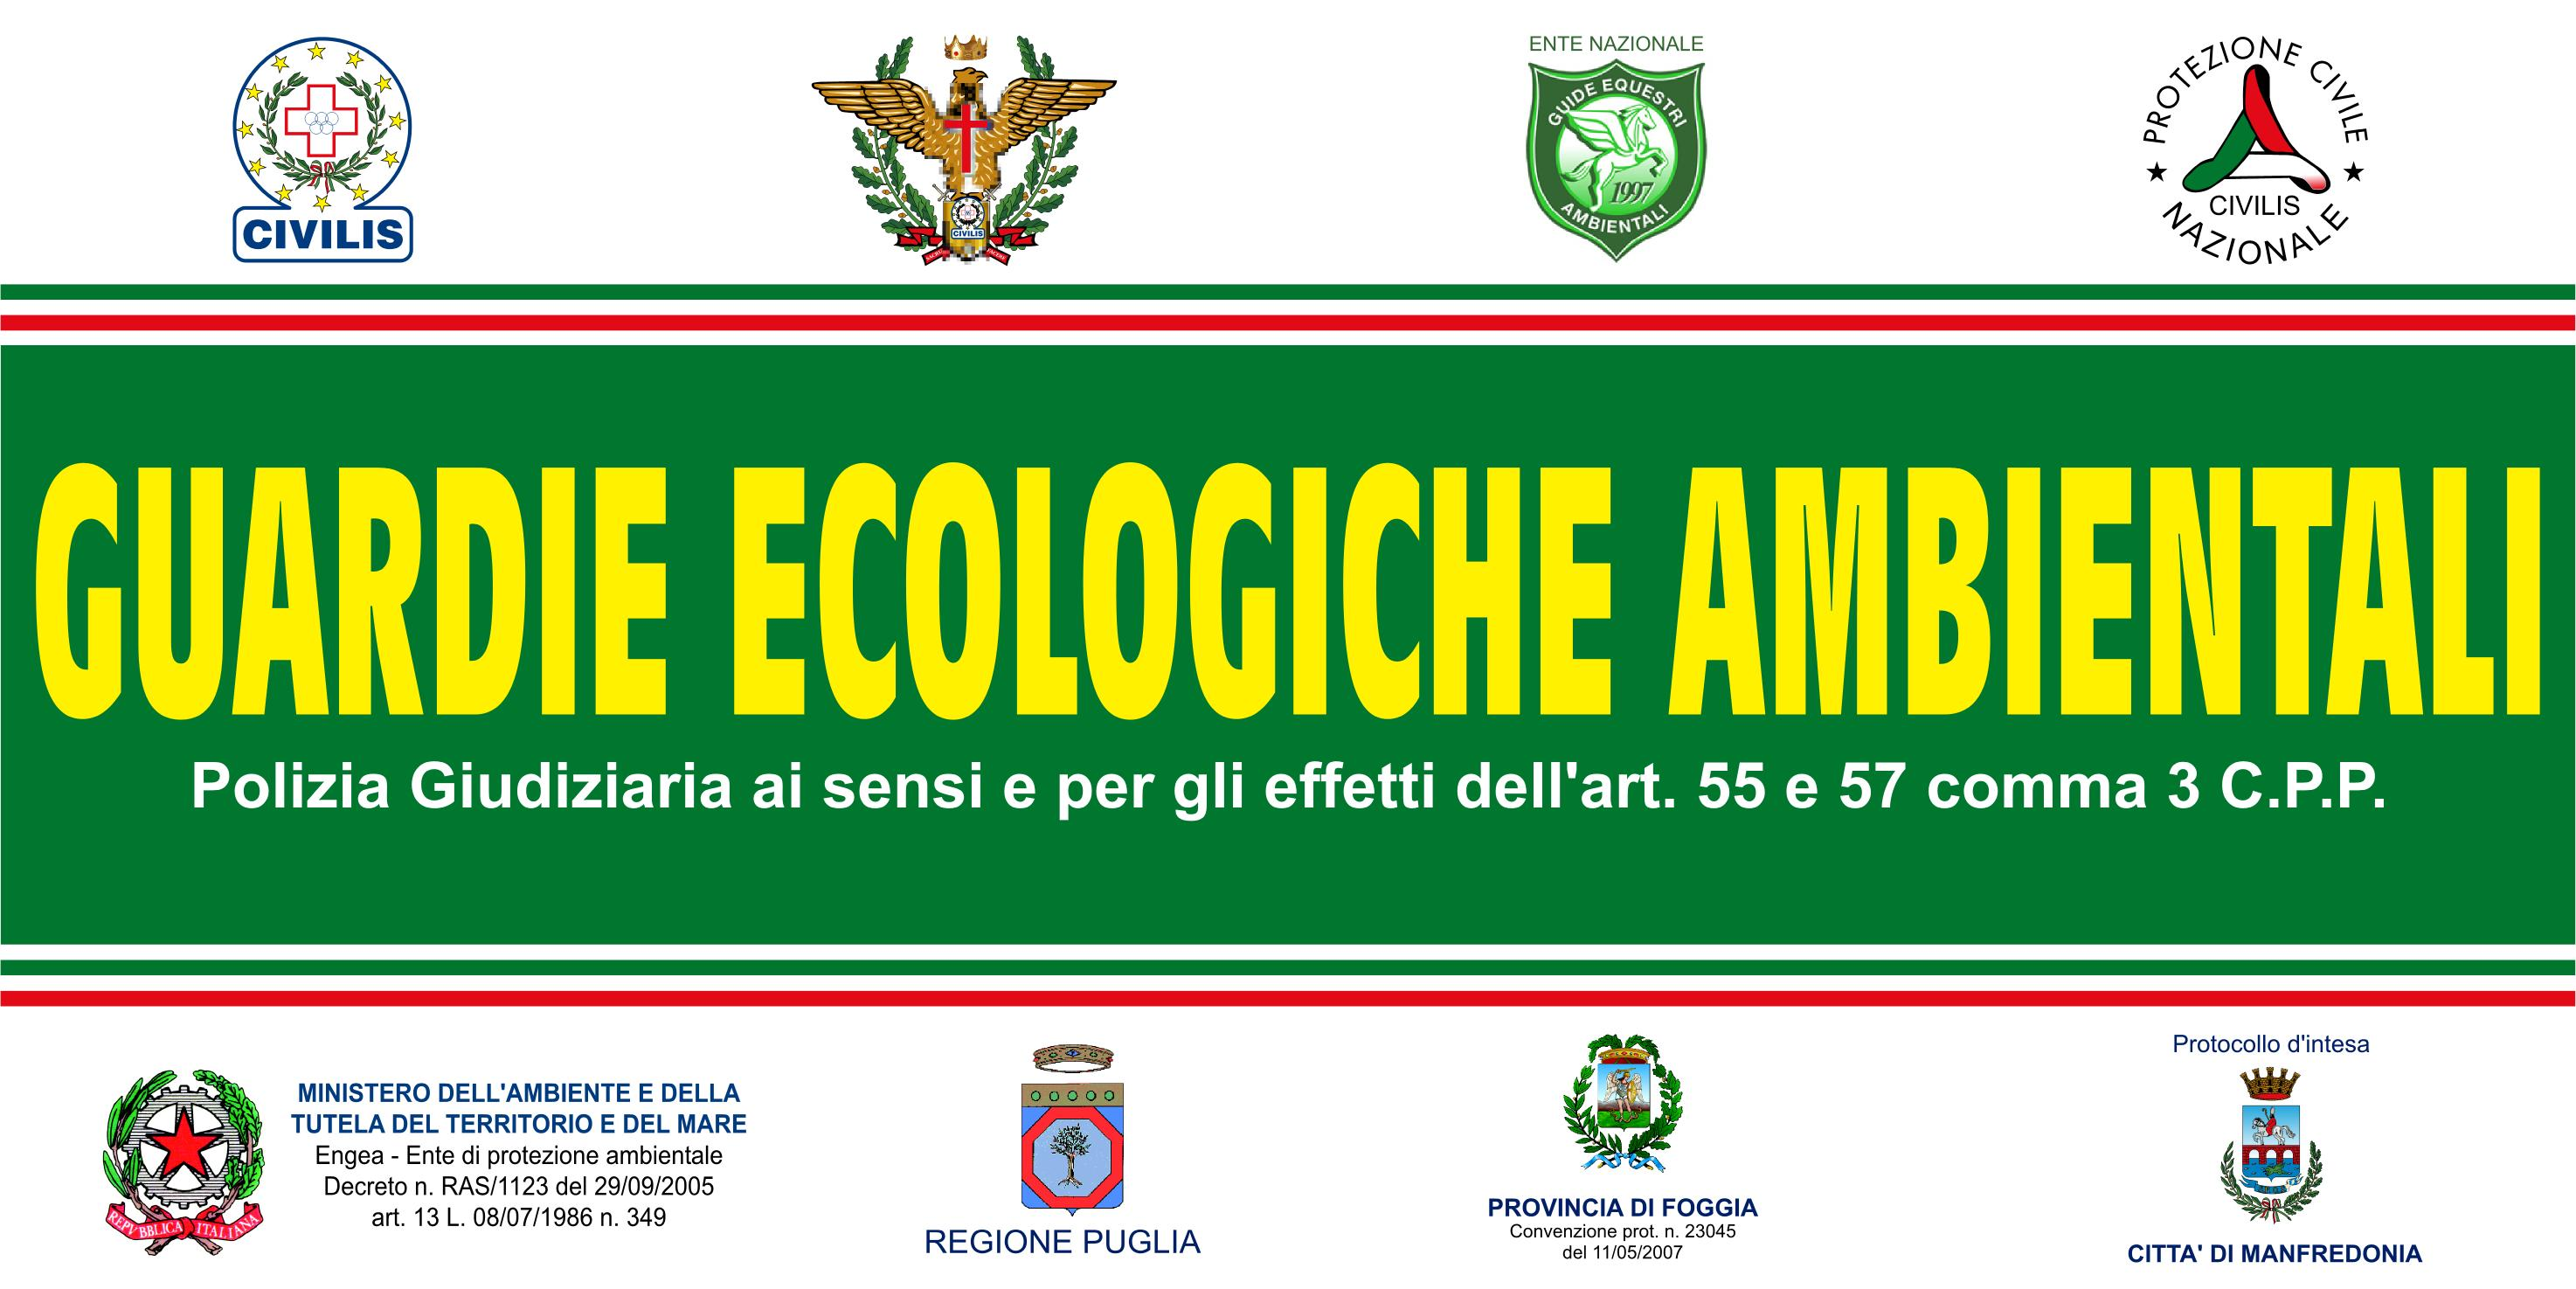 guardie ecologiche ambientali